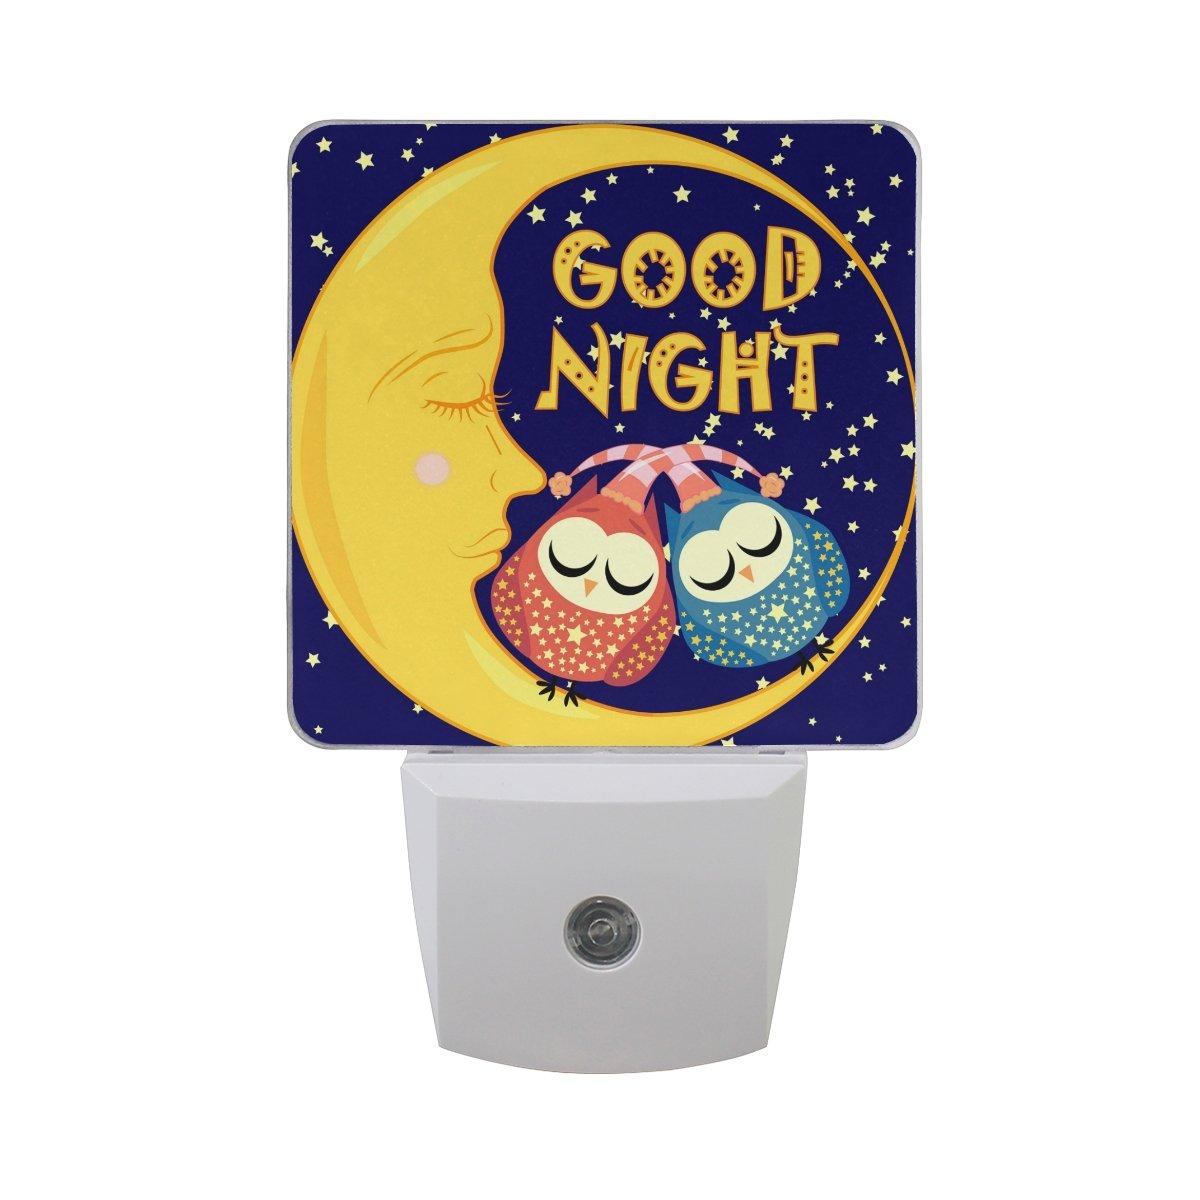 JOYPRINT Led Night Light Good Night Cute Owl Moon Star, Auto Senor Dusk to Dawn Night Light Plug in for Kids Baby Girls Boys Adults Room